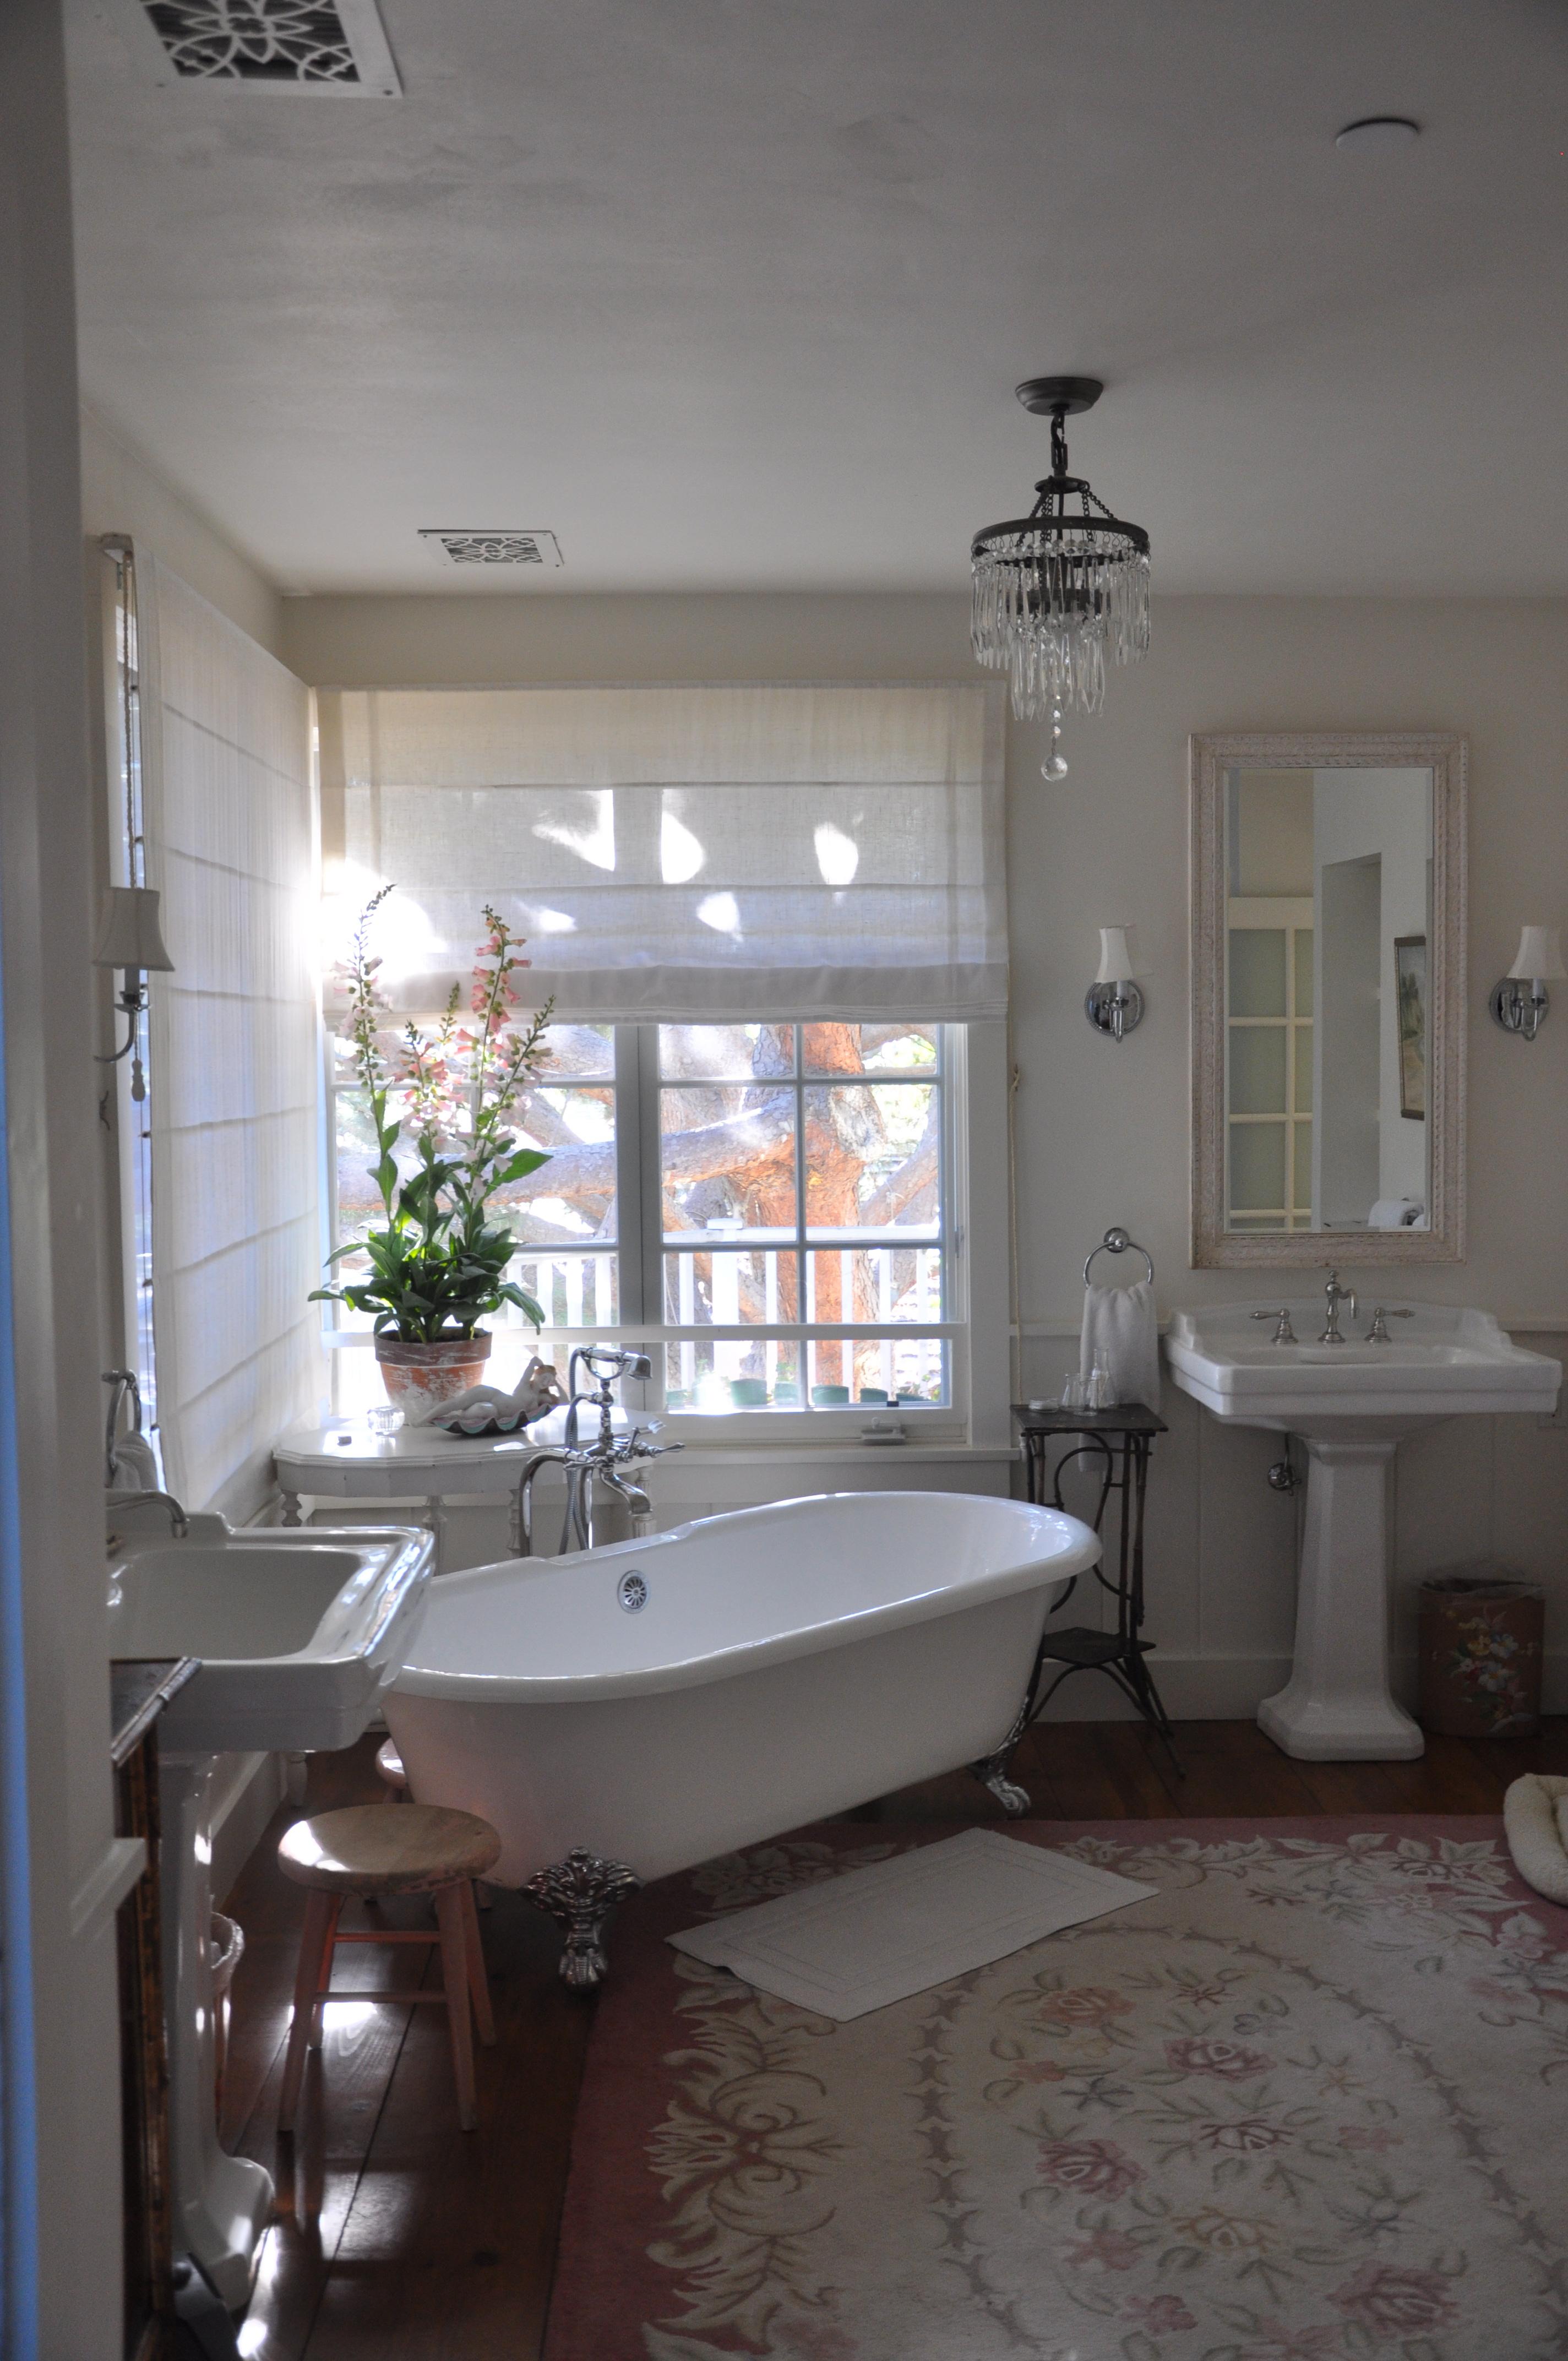 What Weve Learned Vent Grillesregisters Velvet Linen - Bathroom exhaust vent cover for bathroom decor ideas